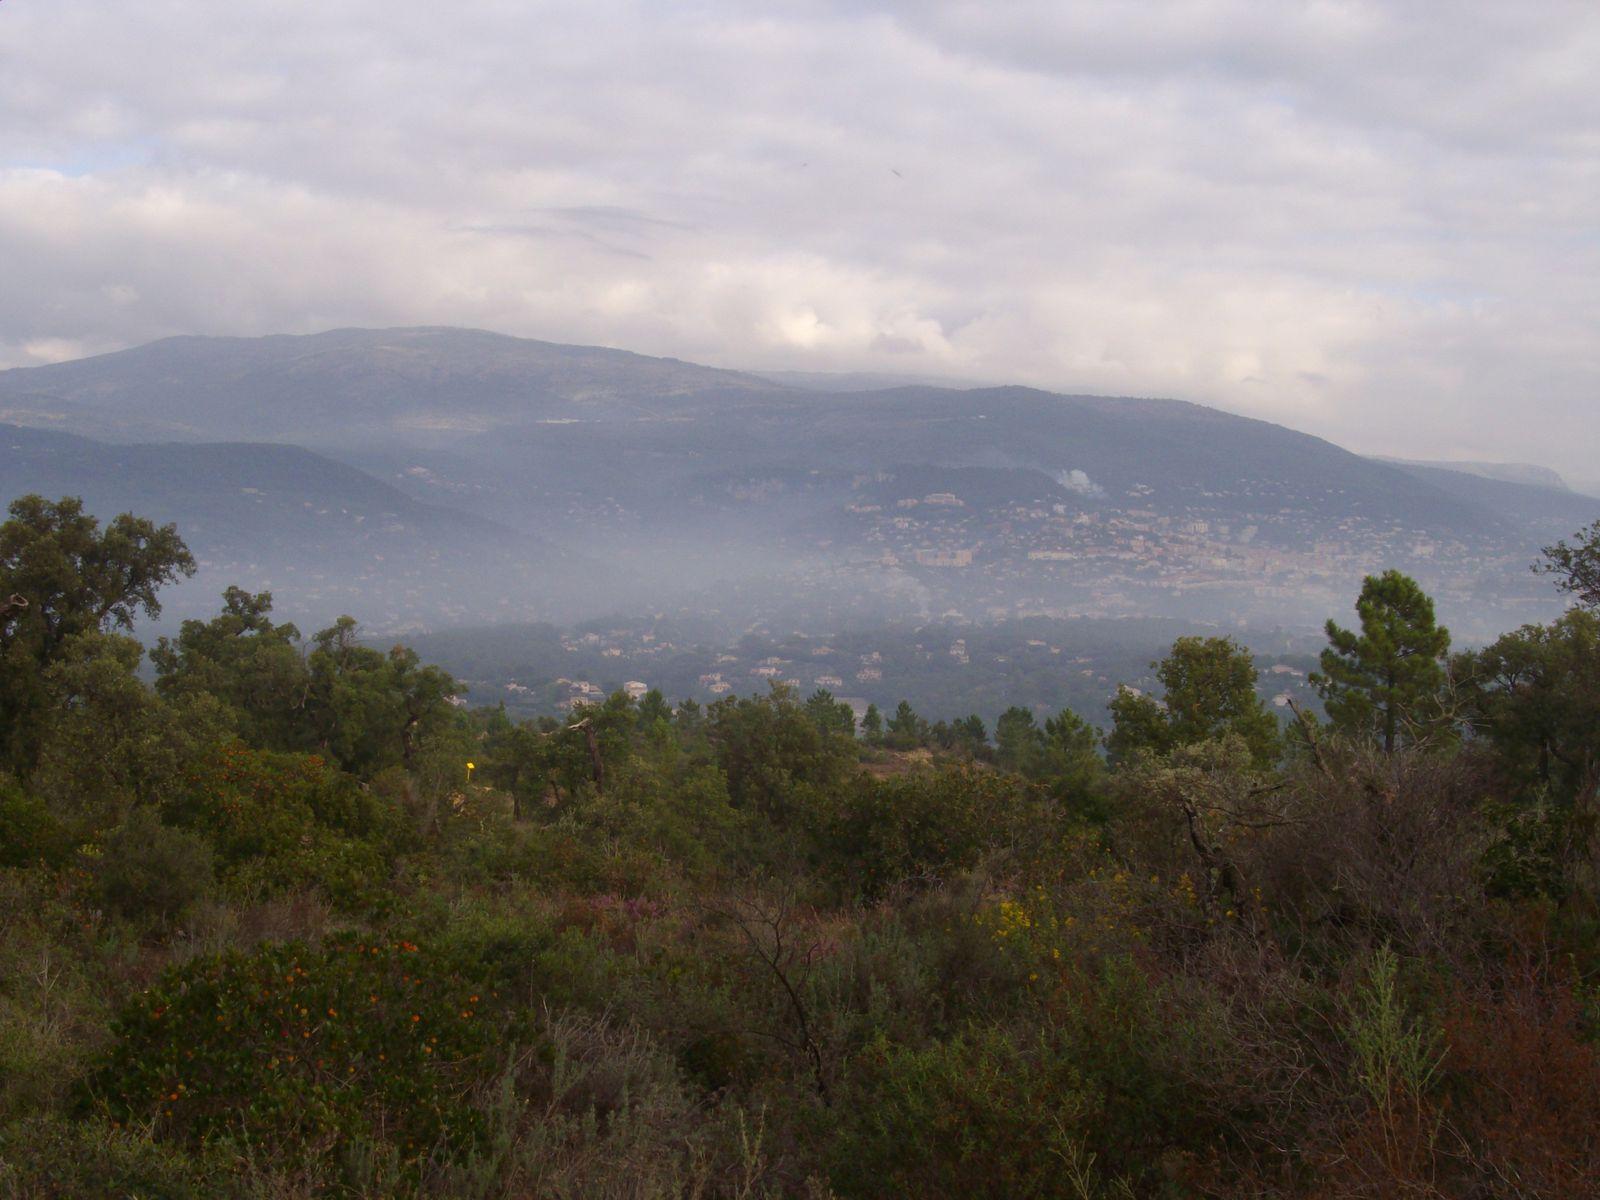 Peygros (205m)